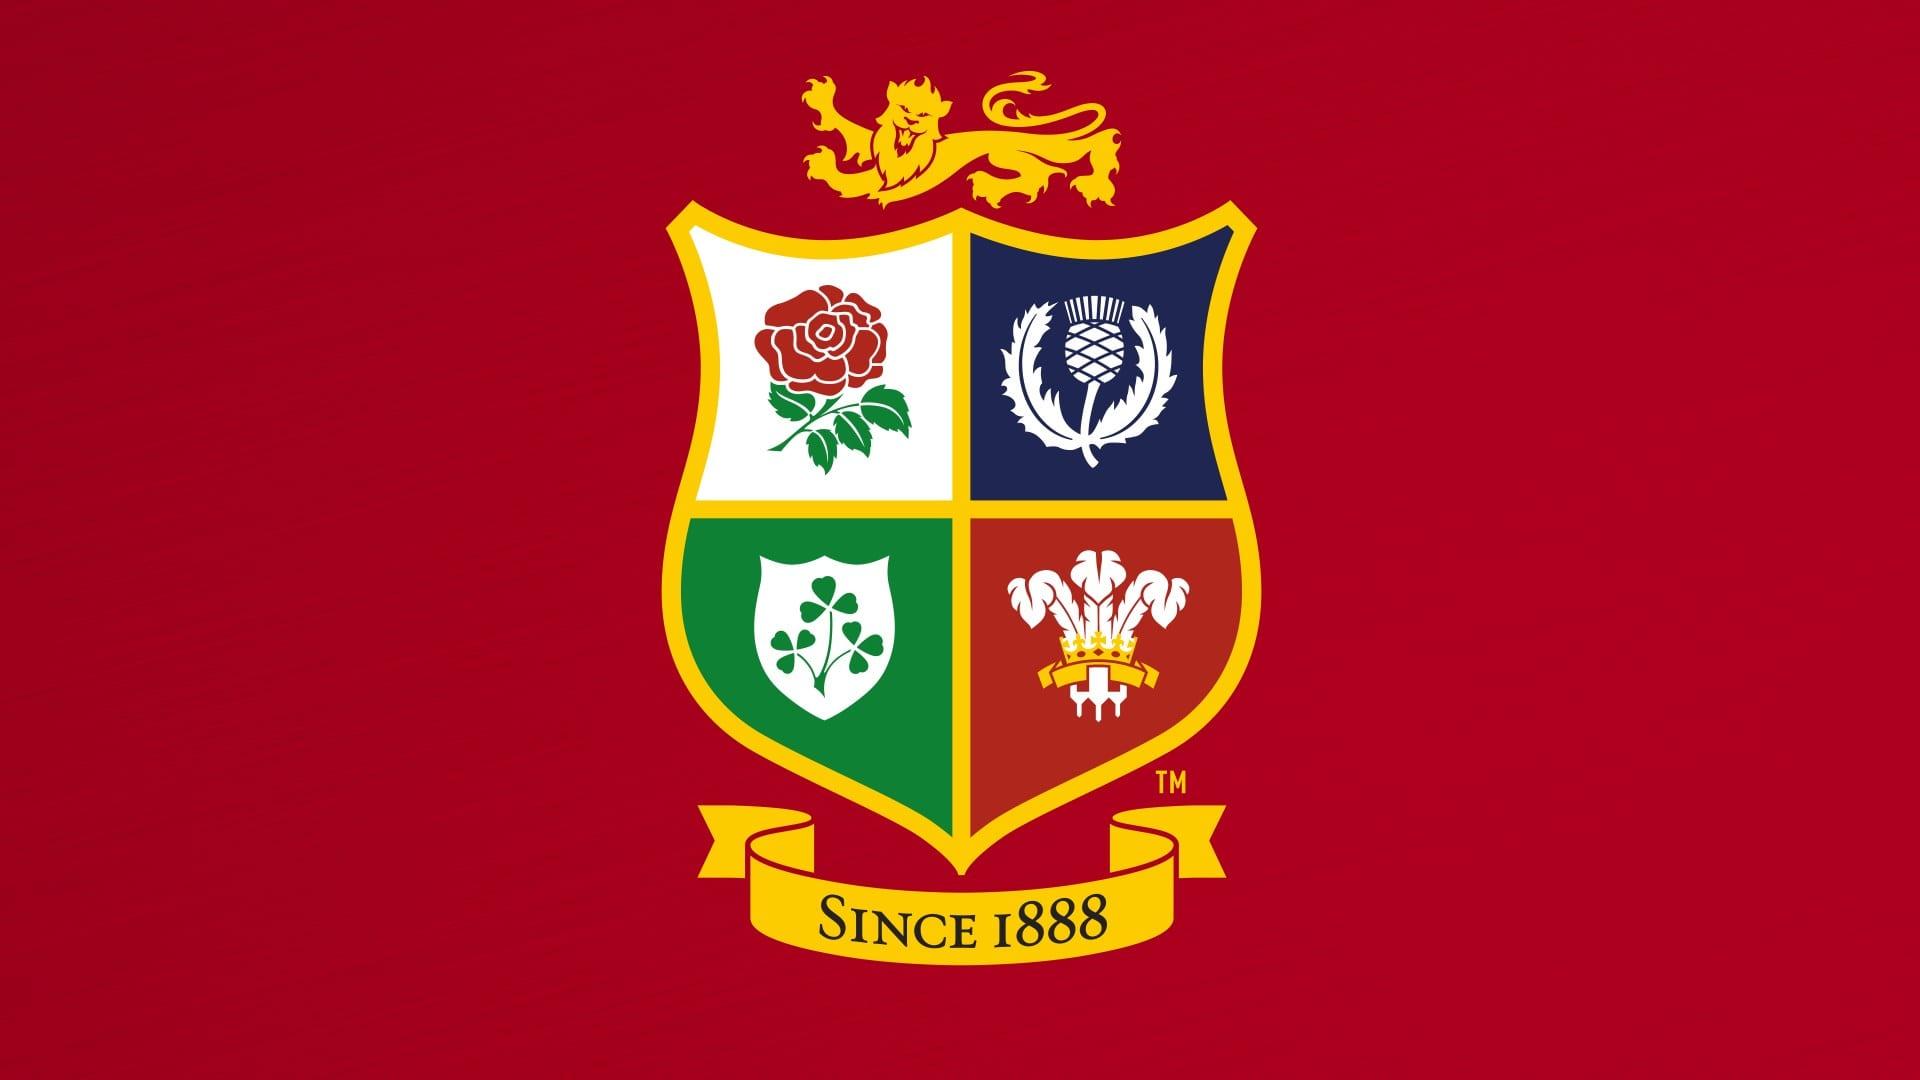 British Irish Lions